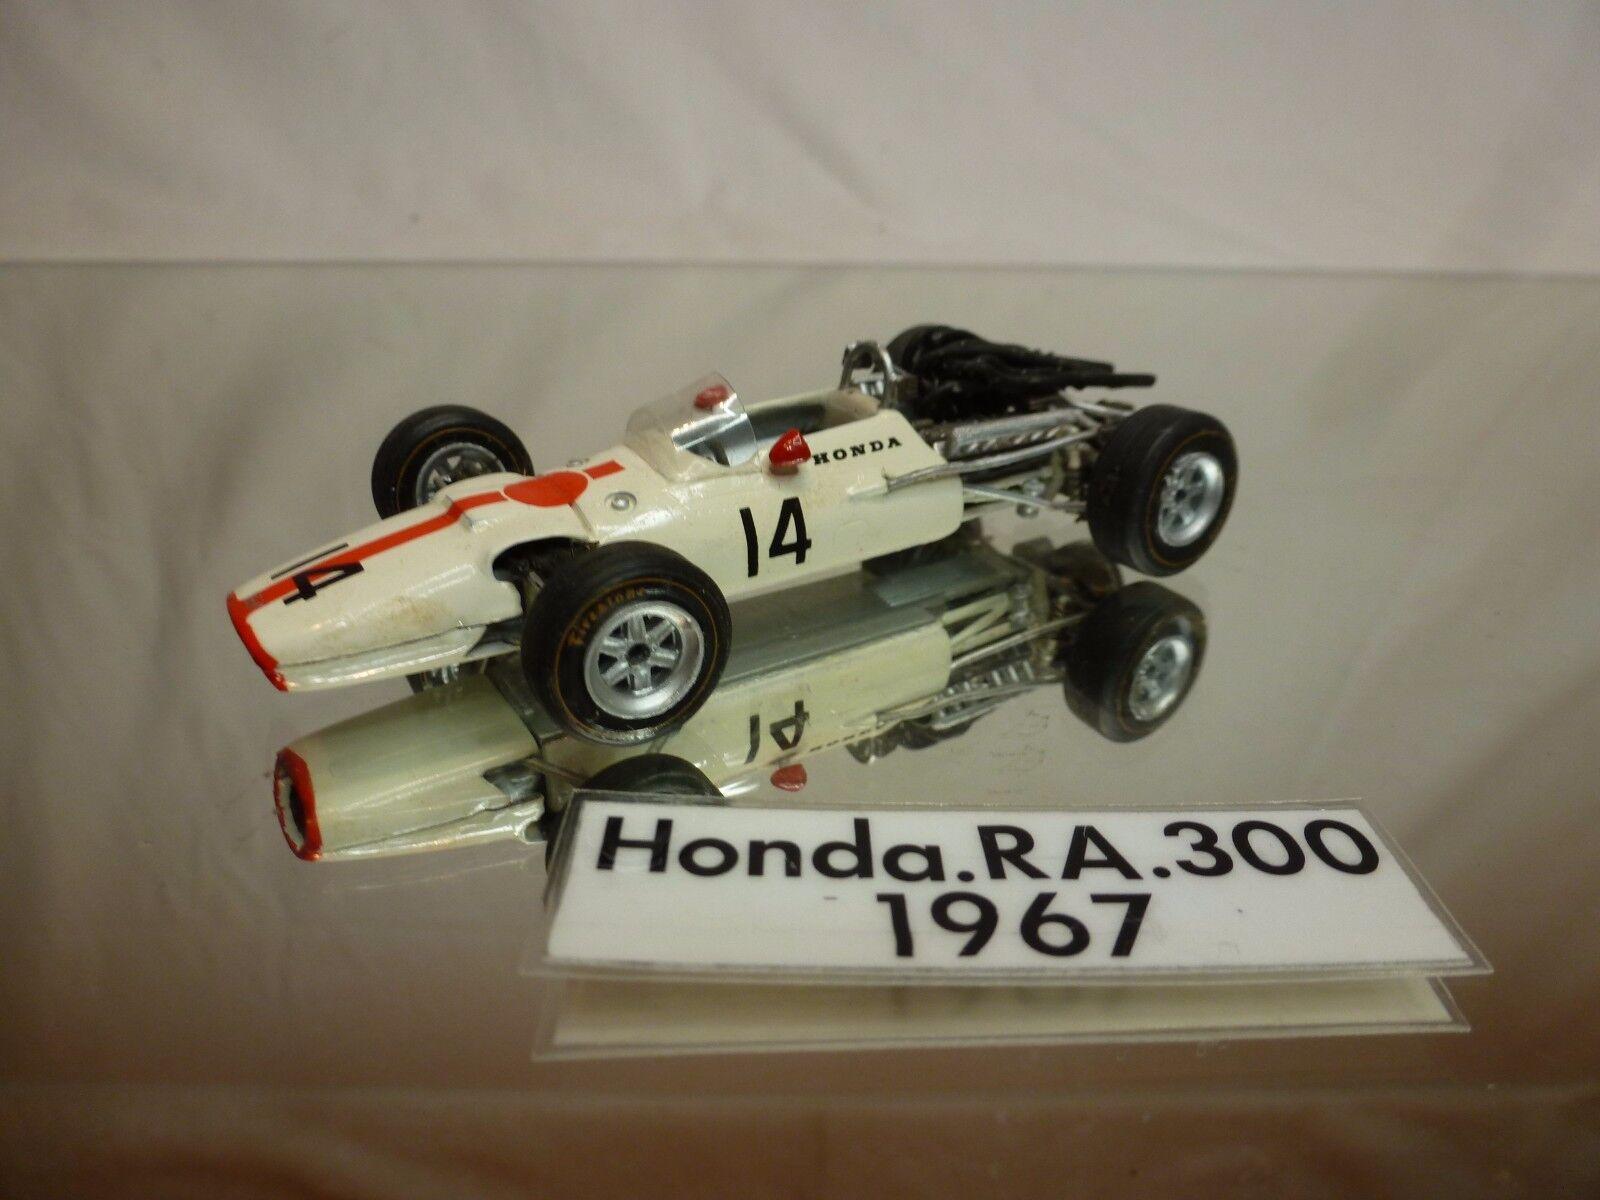 SRC  KIT (built) HONDA RA300 - 1967 JOHN SURTEES No 14 - F1 blanco 1 43 - NICE